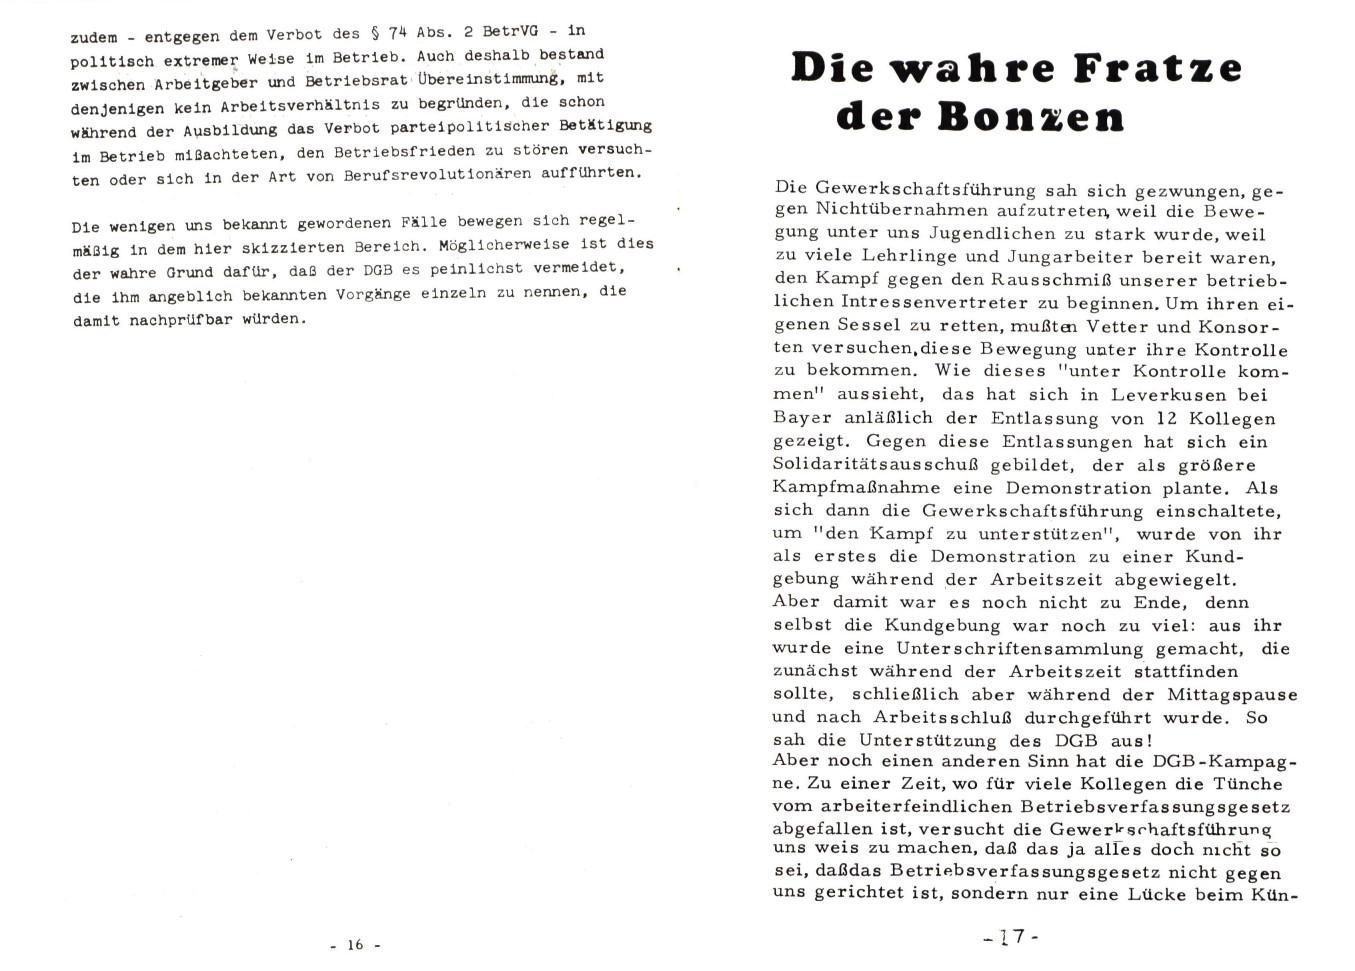 KJV_1973_NK_Arbeiterjugend_25